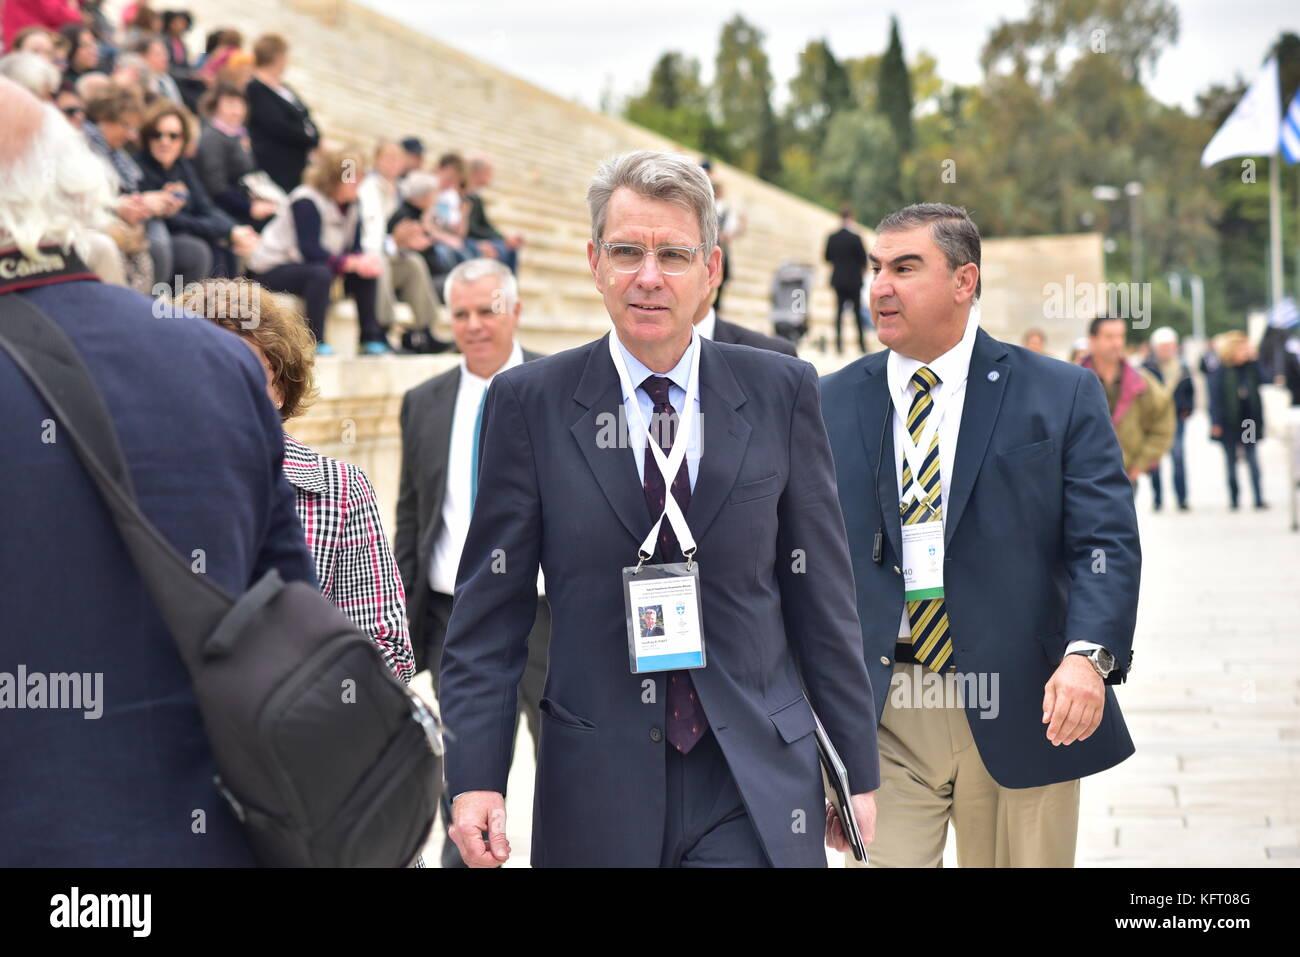 Athens, Greece. 31st Oct, 2017. United States Ambassador to Greece Geoffrey Ross Pyatt in Panathenaic Stadium. The Stock Photo